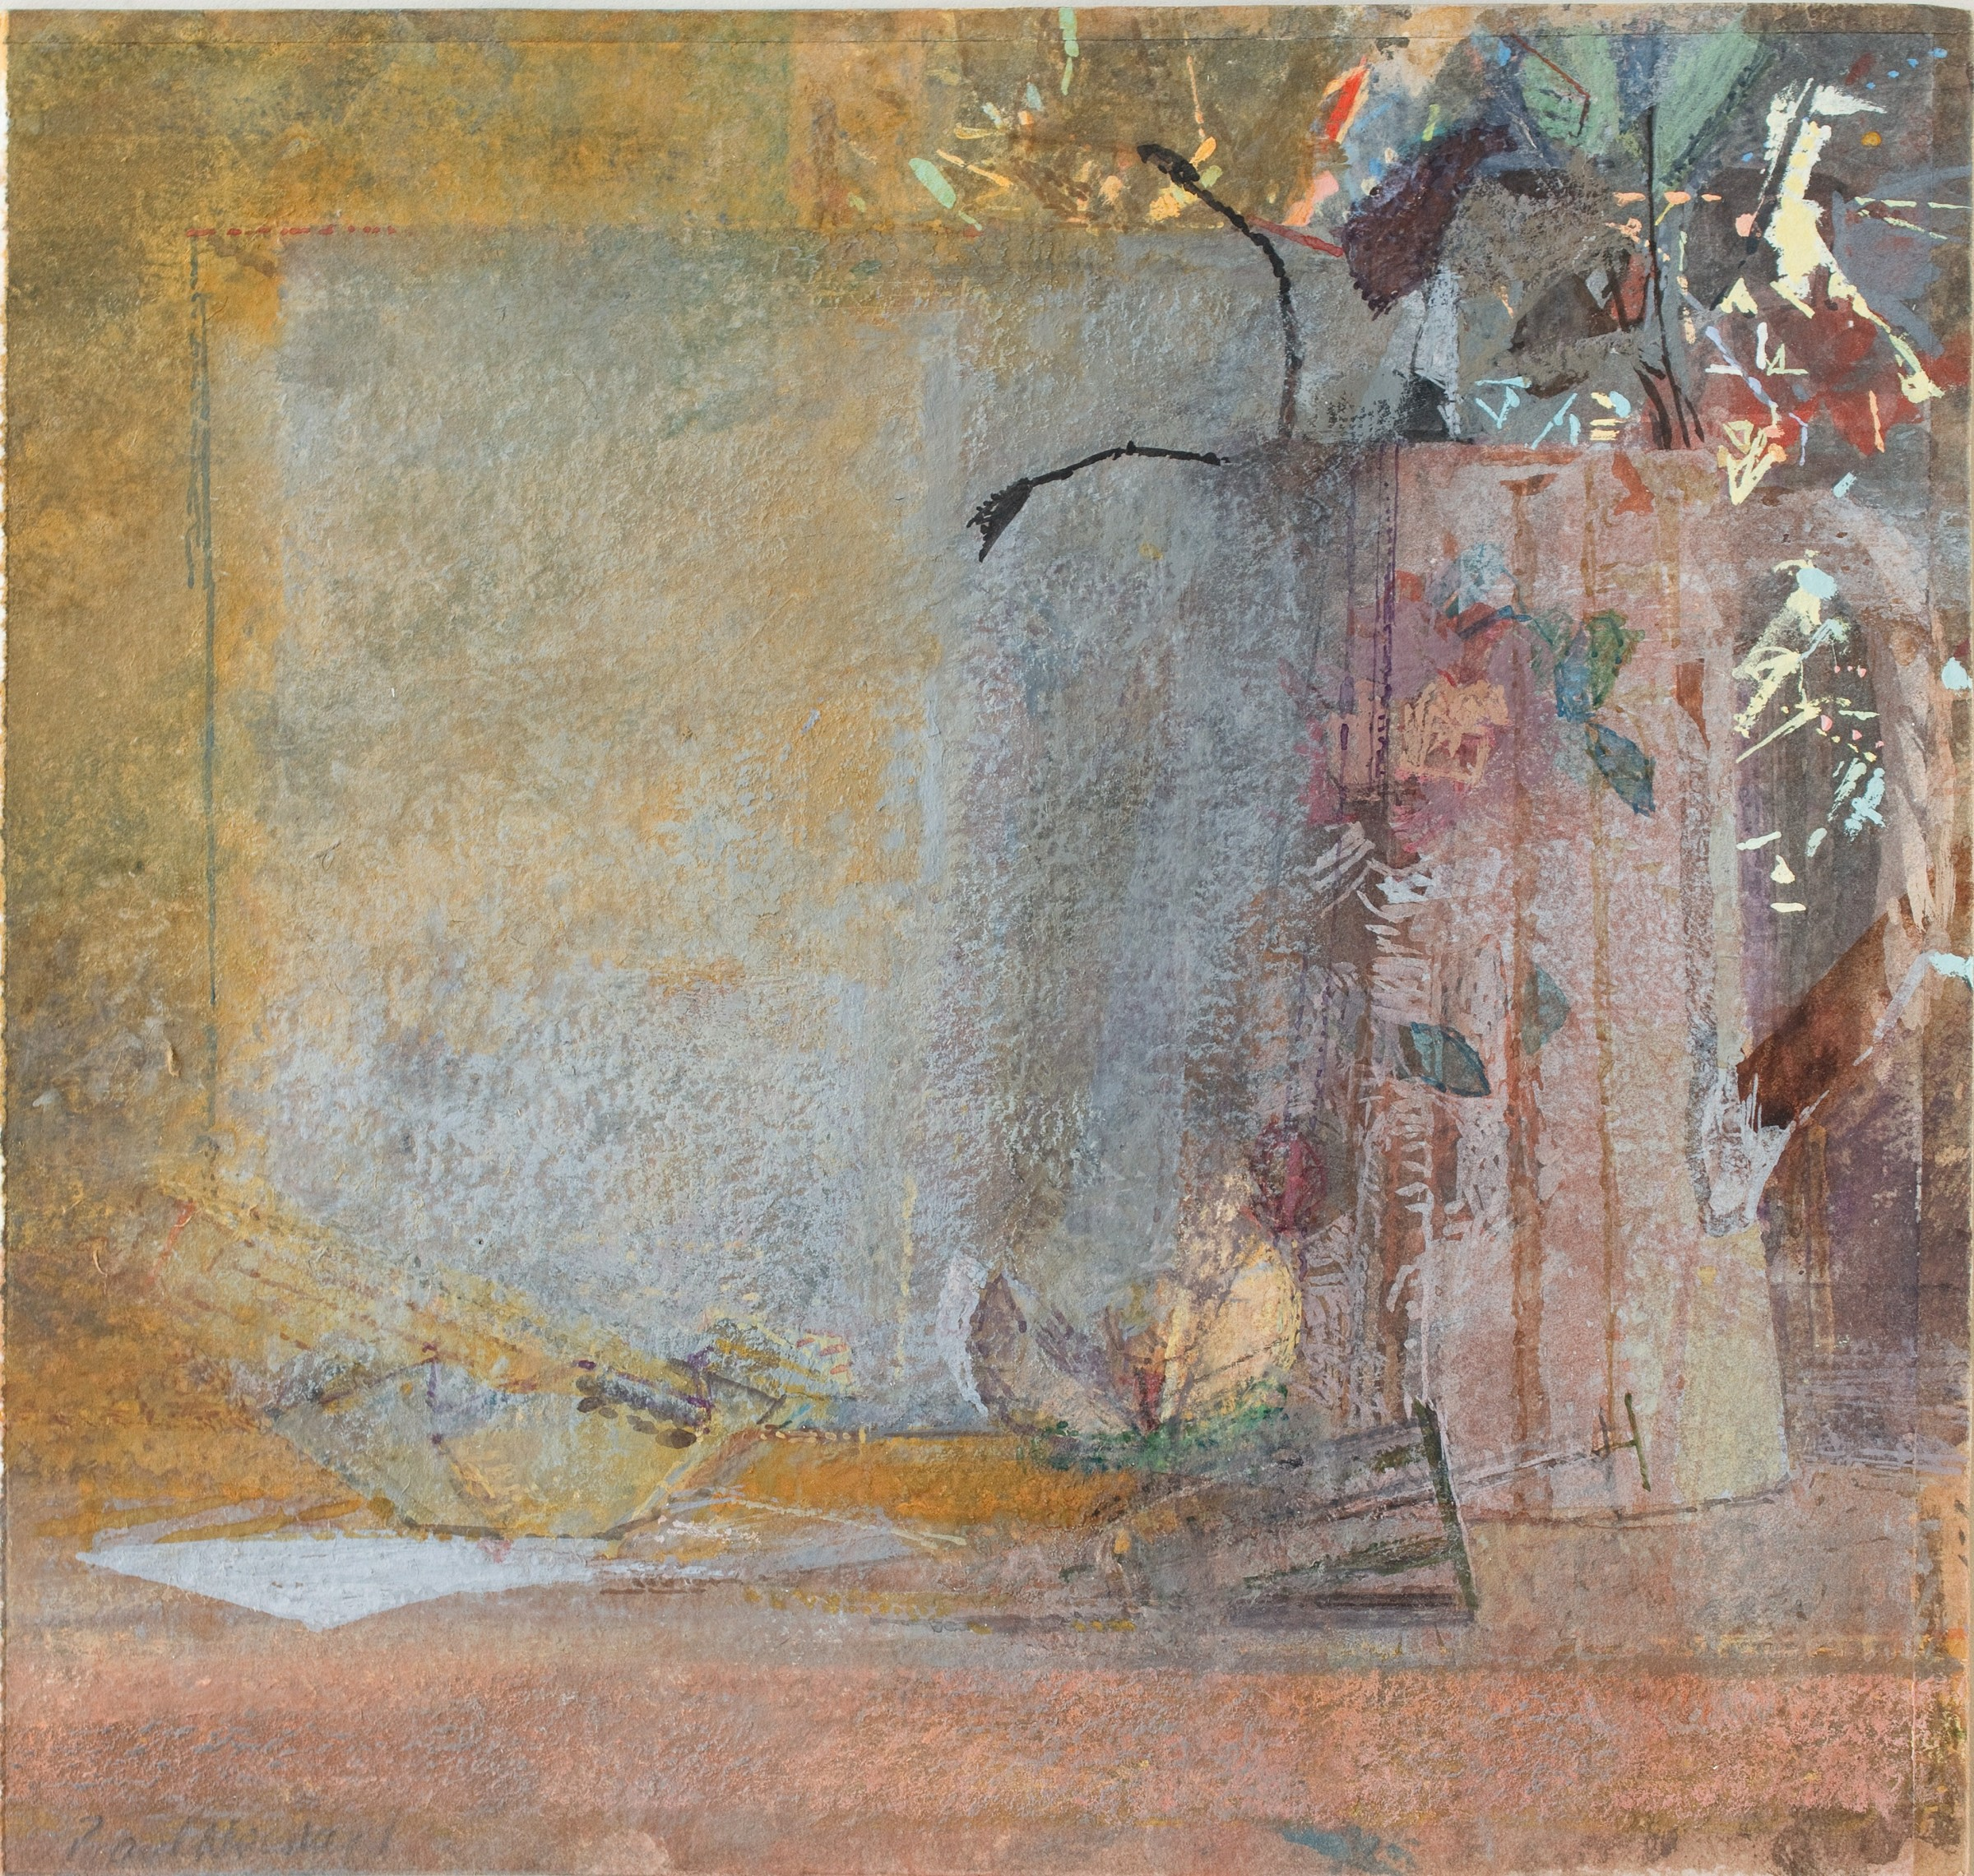 <span class=&#34;link fancybox-details-link&#34;><a href=&#34;/artists/87-paul-newland/works/10221-paul-newland-jug-holographic-paper-cube-tin-toy/&#34;>View Detail Page</a></span><div class=&#34;artist&#34;><span class=&#34;artist&#34;><strong>Paul Newland</strong></span></div><div class=&#34;title&#34;><em>Jug, Holographic Paper, Cube & Tin Toy</em></div><div class=&#34;medium&#34;>Watercolour & Gouache</div><div class=&#34;dimensions&#34;>52cm x 46cm</div><div class=&#34;price&#34;>£525.00</div>